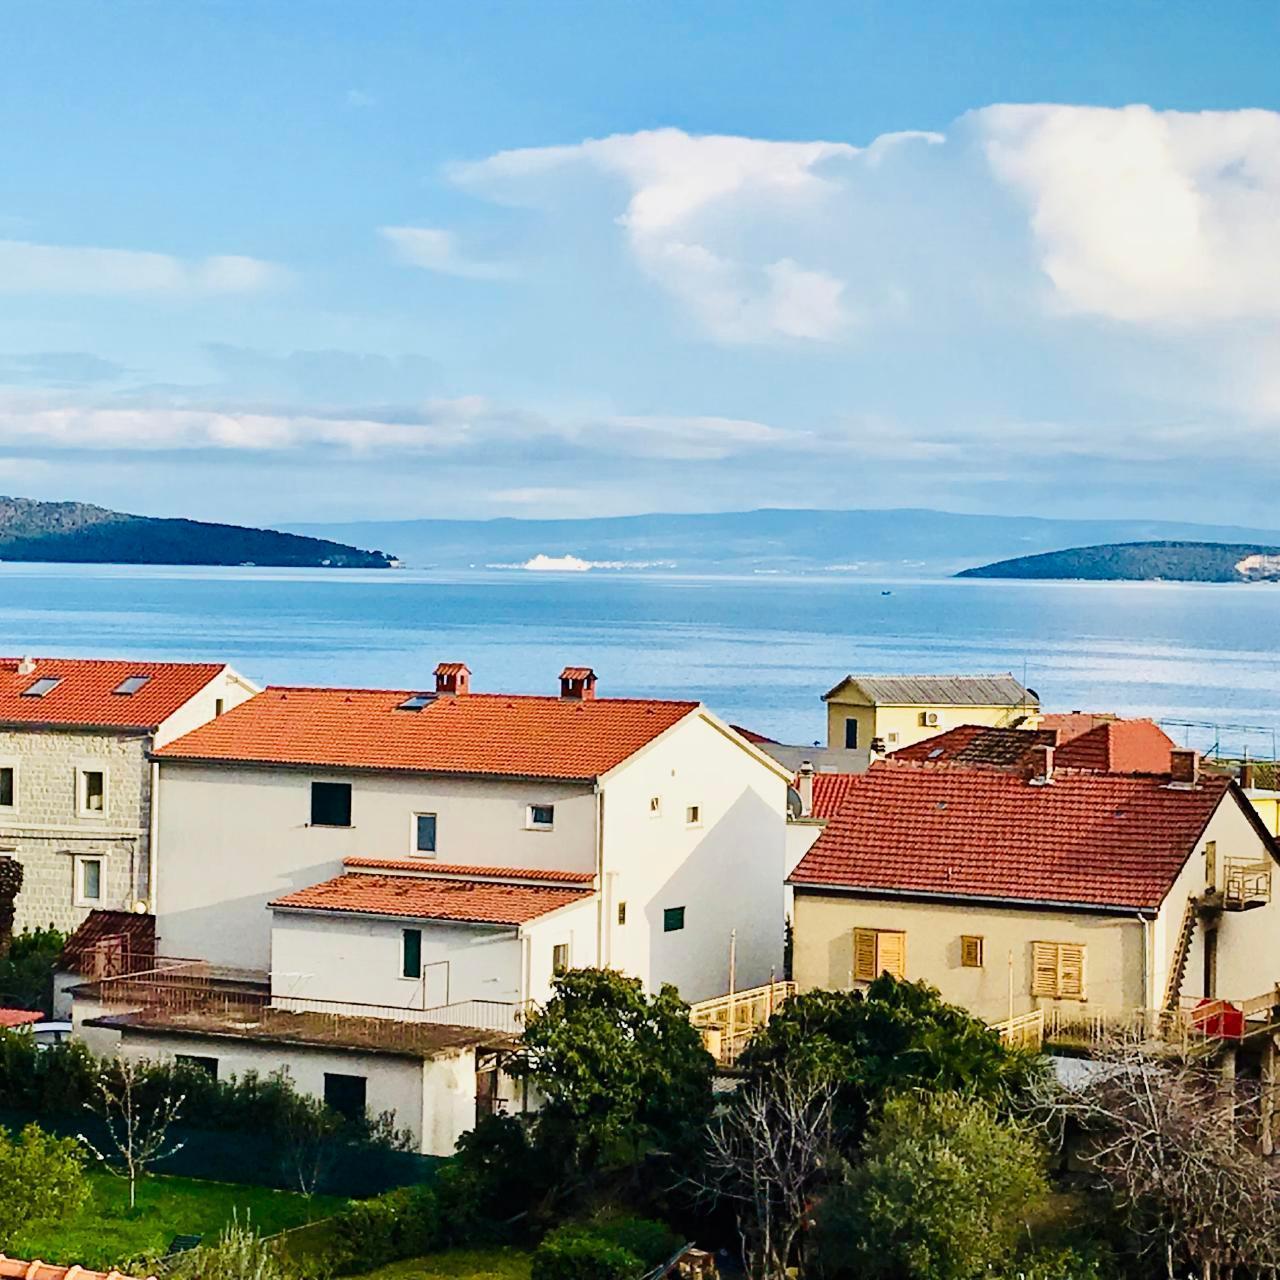 Ferienwohnung Apartmenthaus Ruza 6 - Apartment (98382), Kaštel Štafilić, , Dalmatien, Kroatien, Bild 61